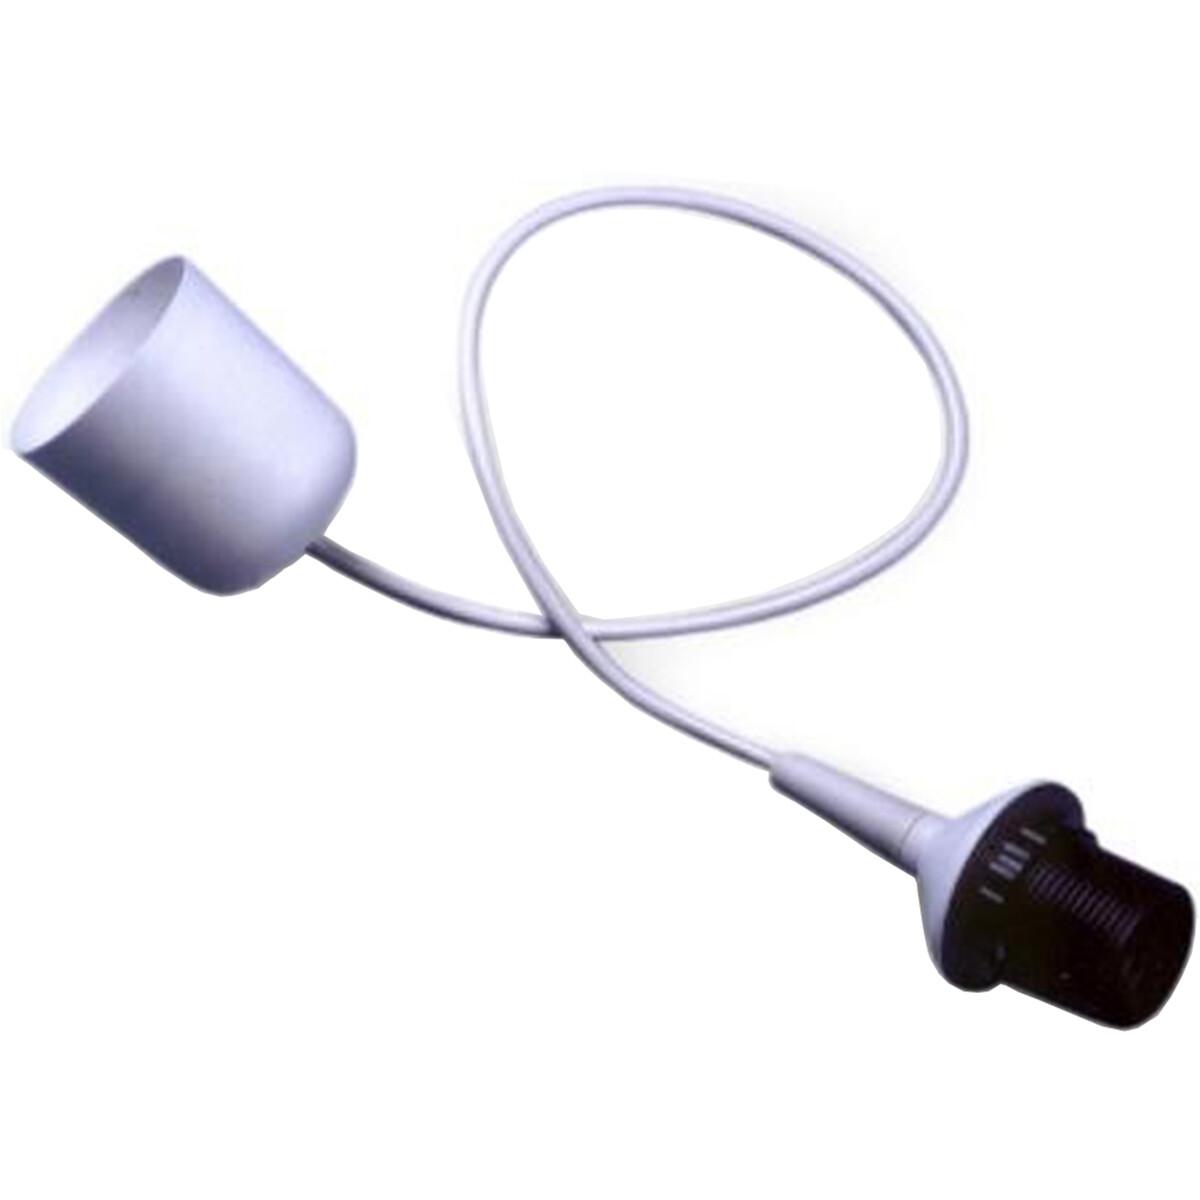 LED Hanglamp - Hangverlichting - Trion Ponton - E27 Fitting - 1-lichts - Rond - Mat Wit - Kunststof